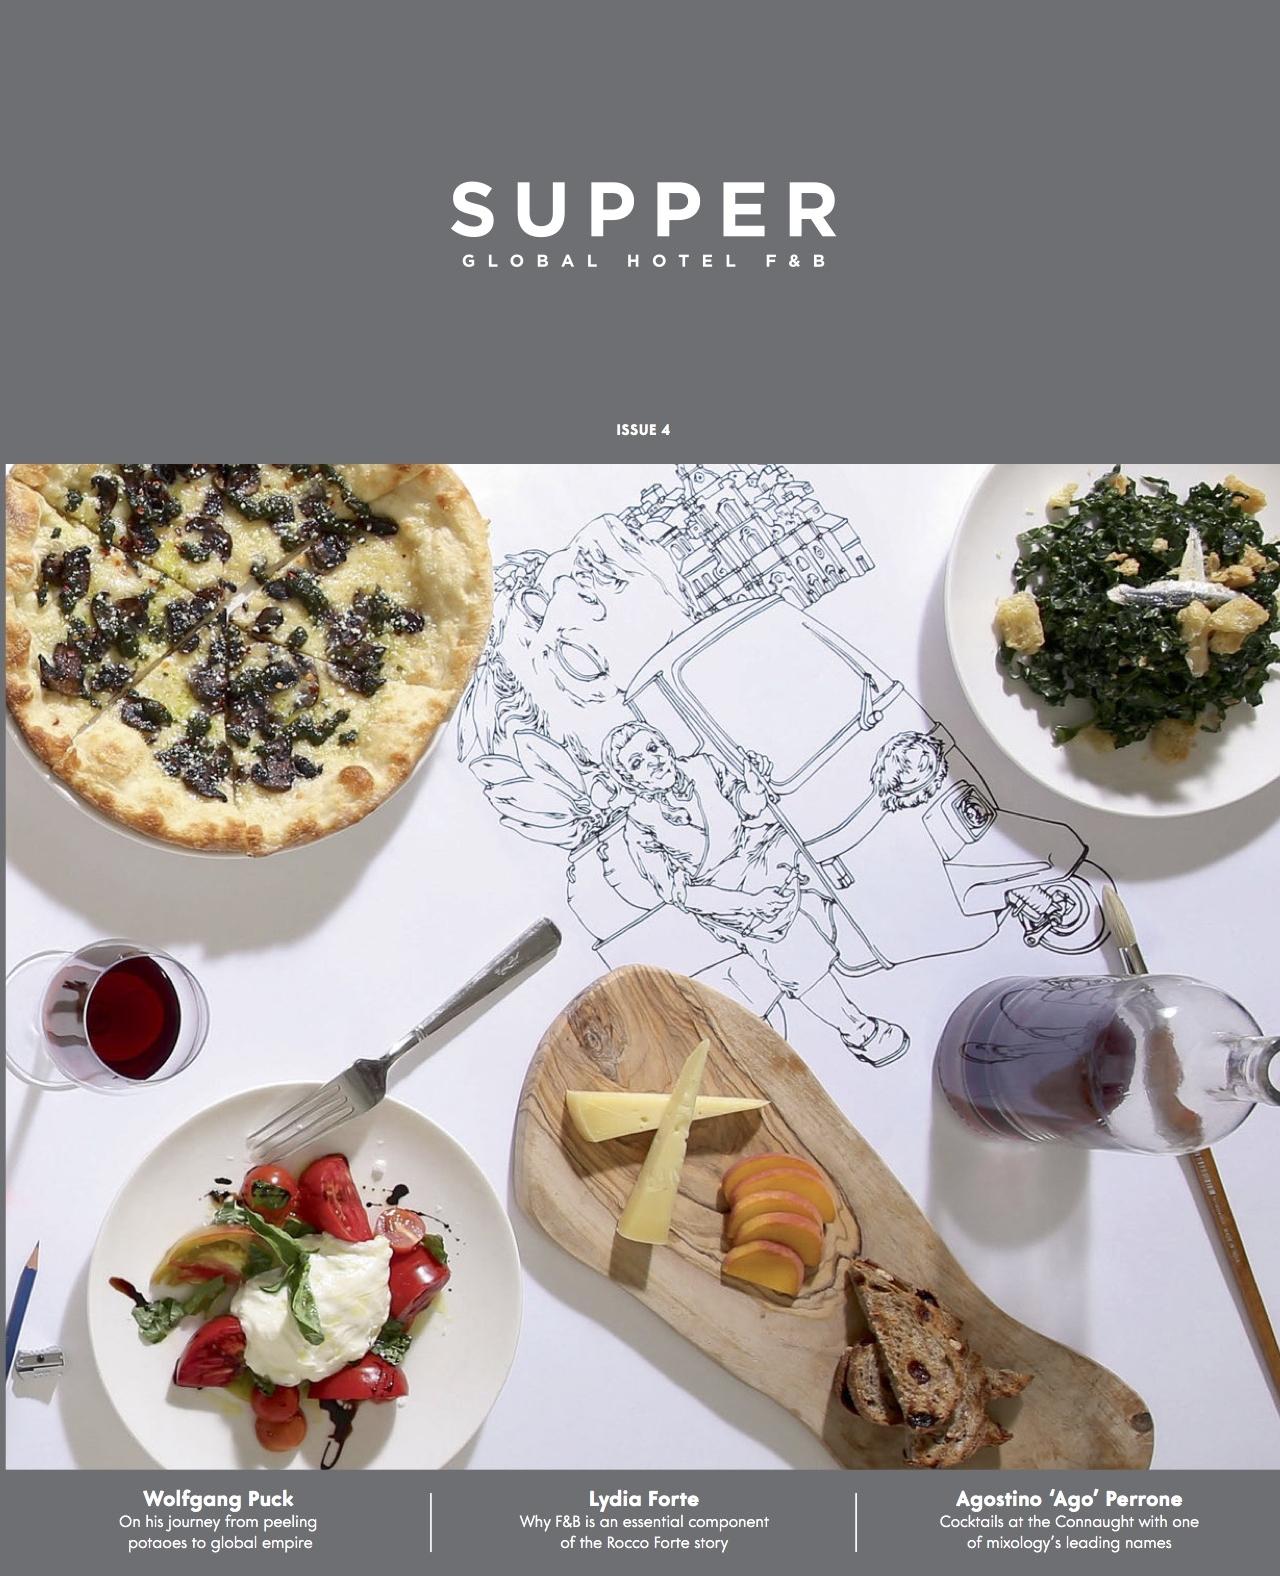 SUPPER_Q4 Issue_Raised_2016.jpg